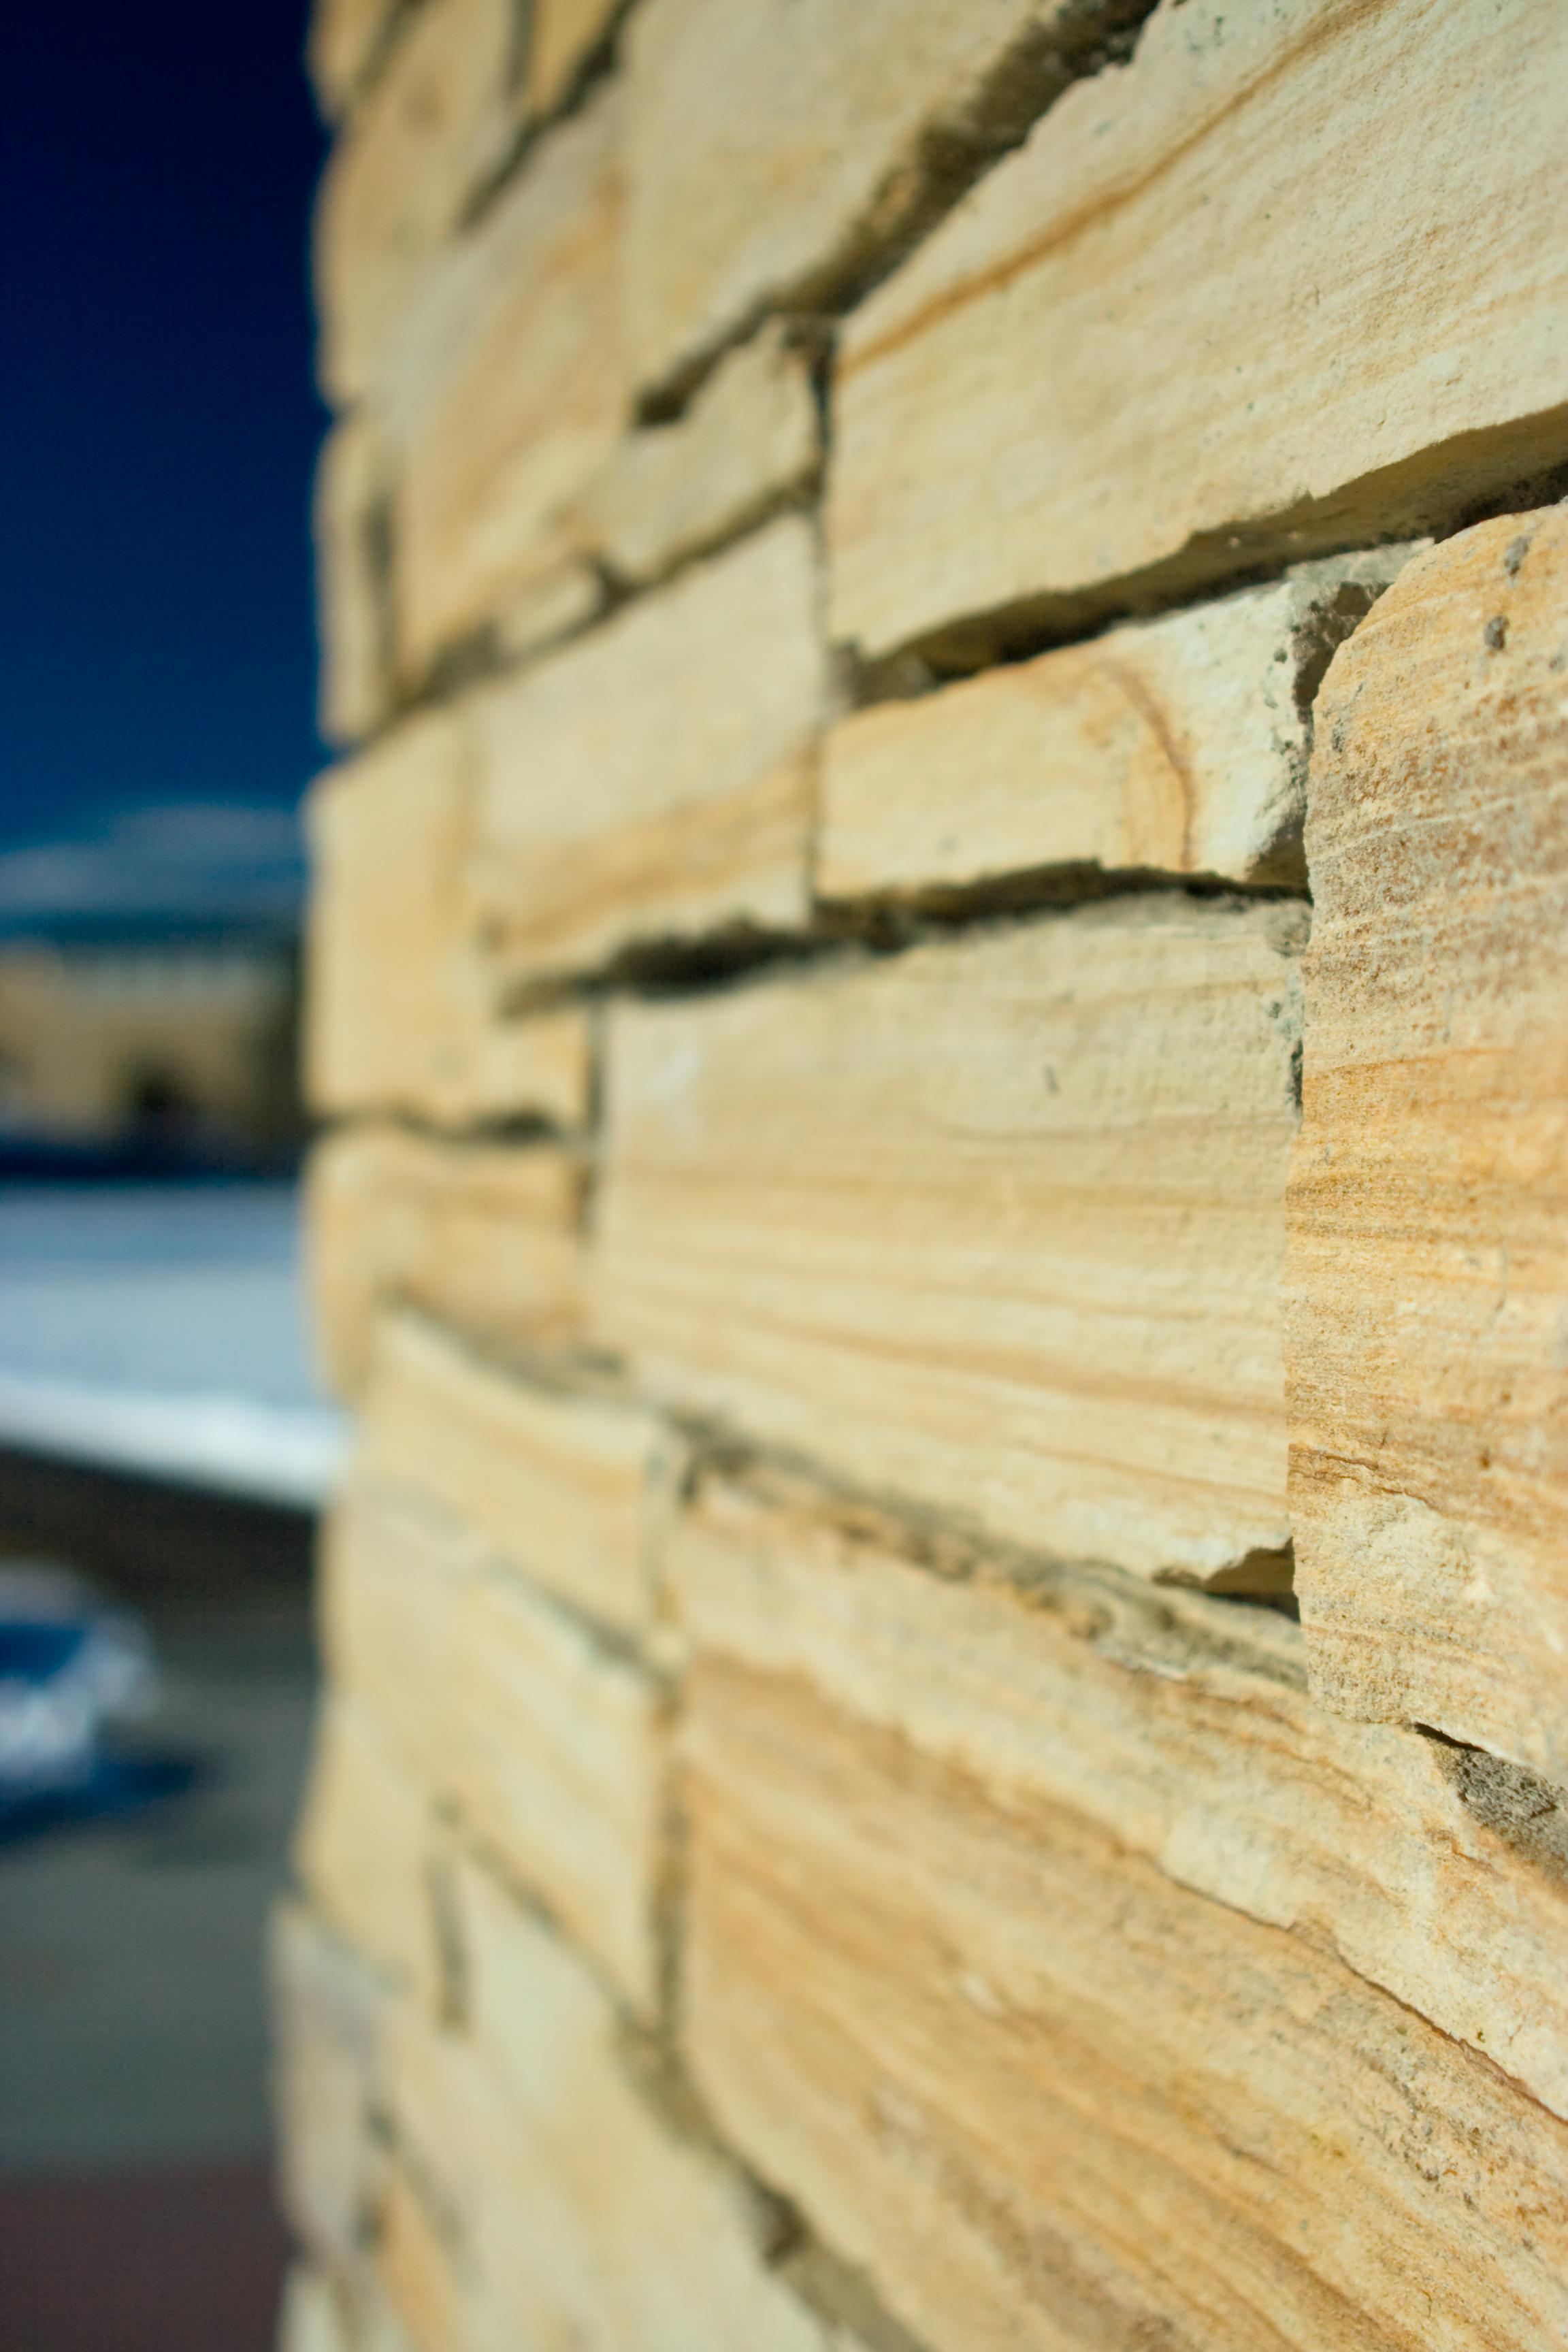 Brick wall, Blue, Brick, Building, Gold, HQ Photo